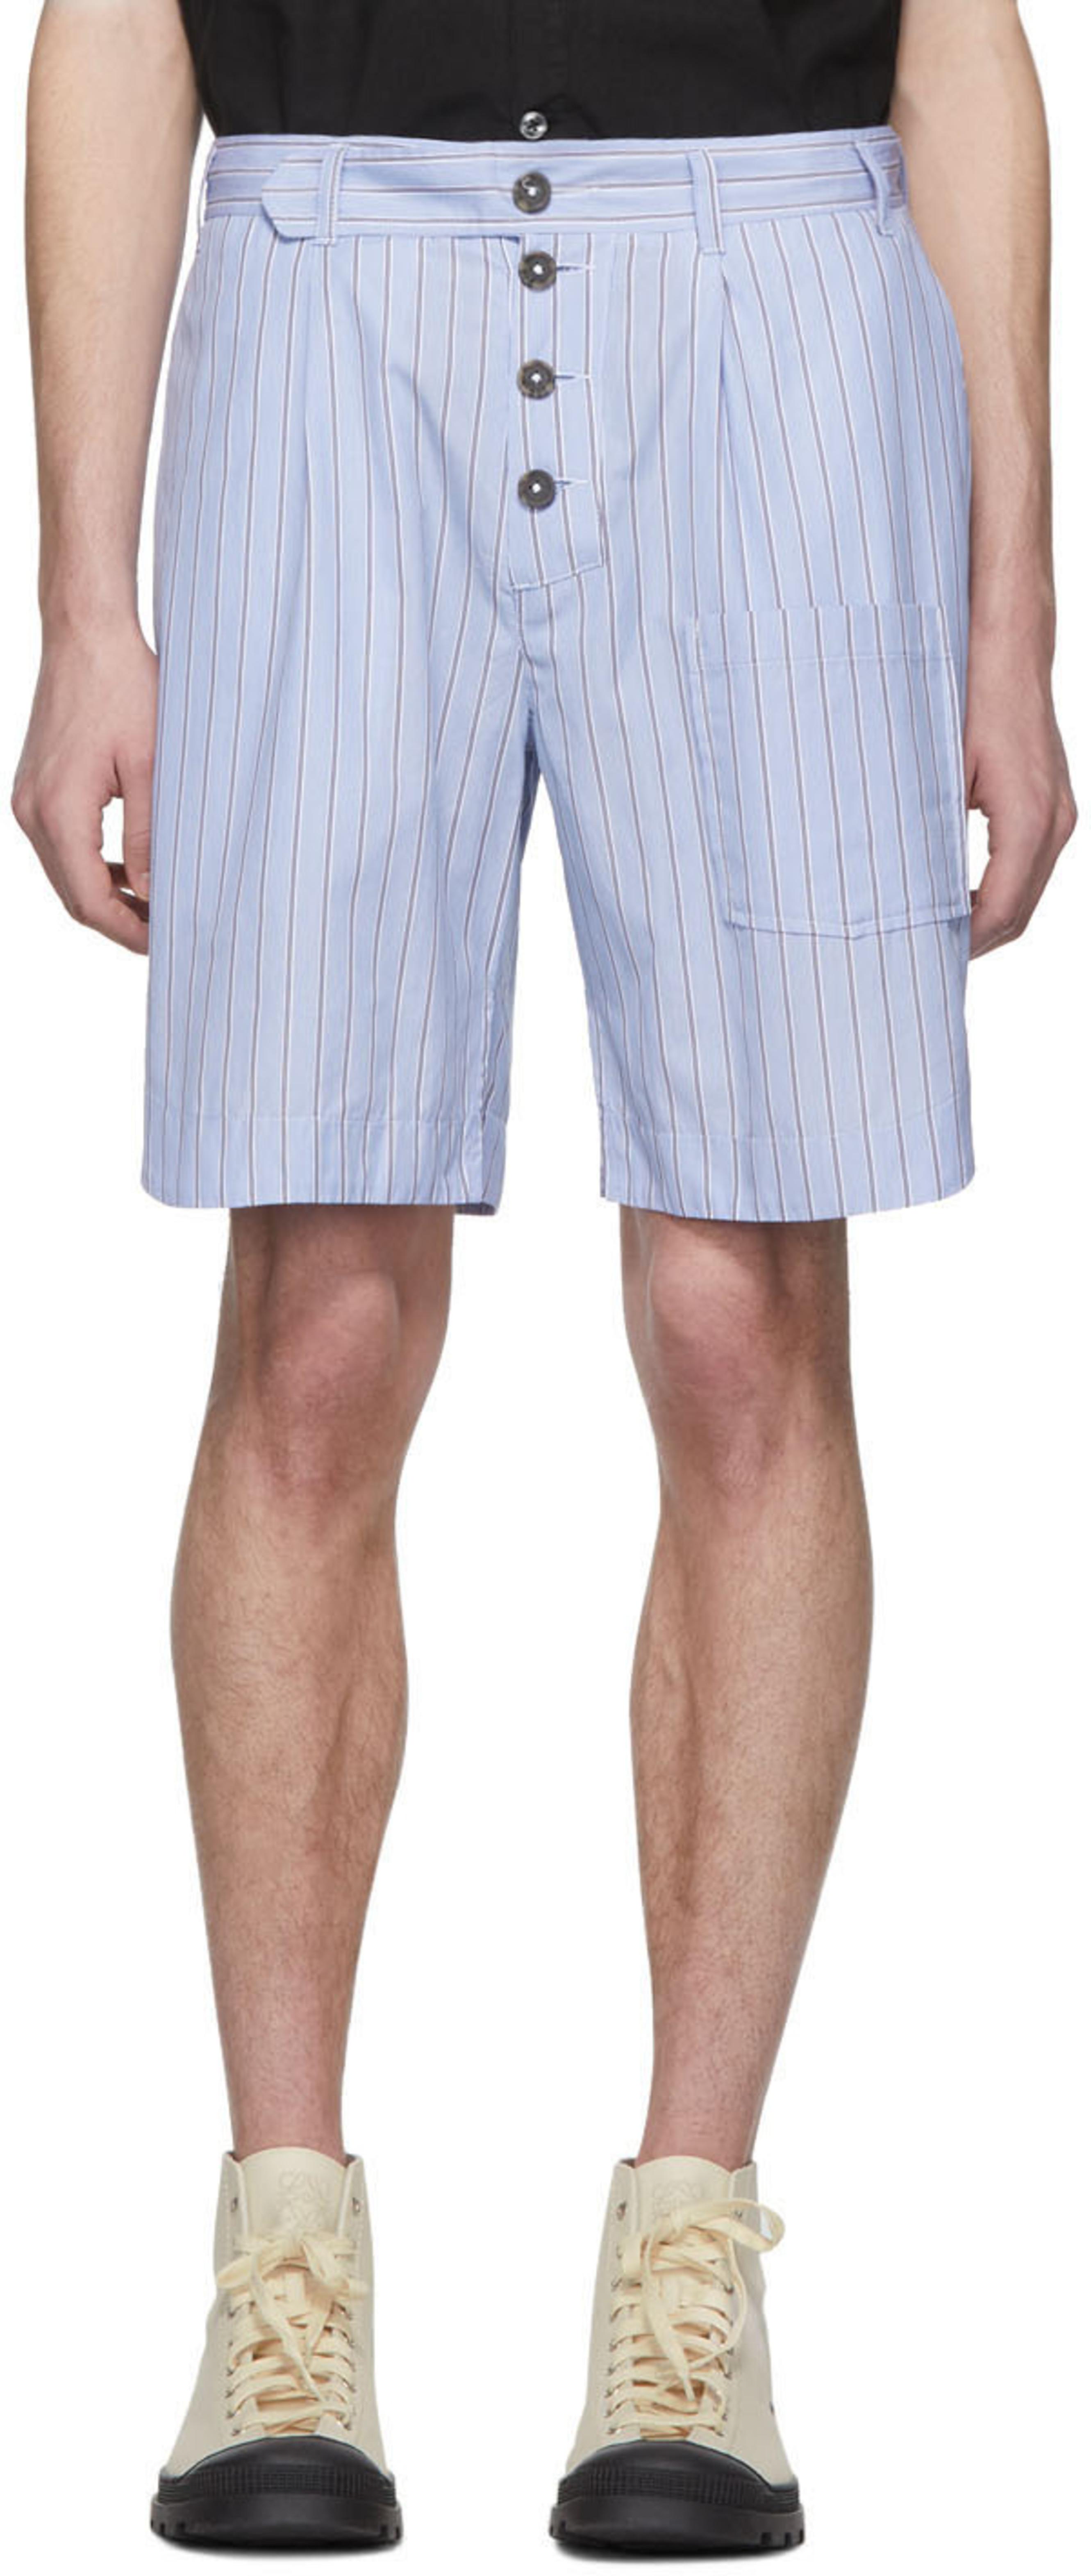 Shorts rayas con Shorts rayas azules con Shorts con azules azules rayas Shorts OkuXiPZ